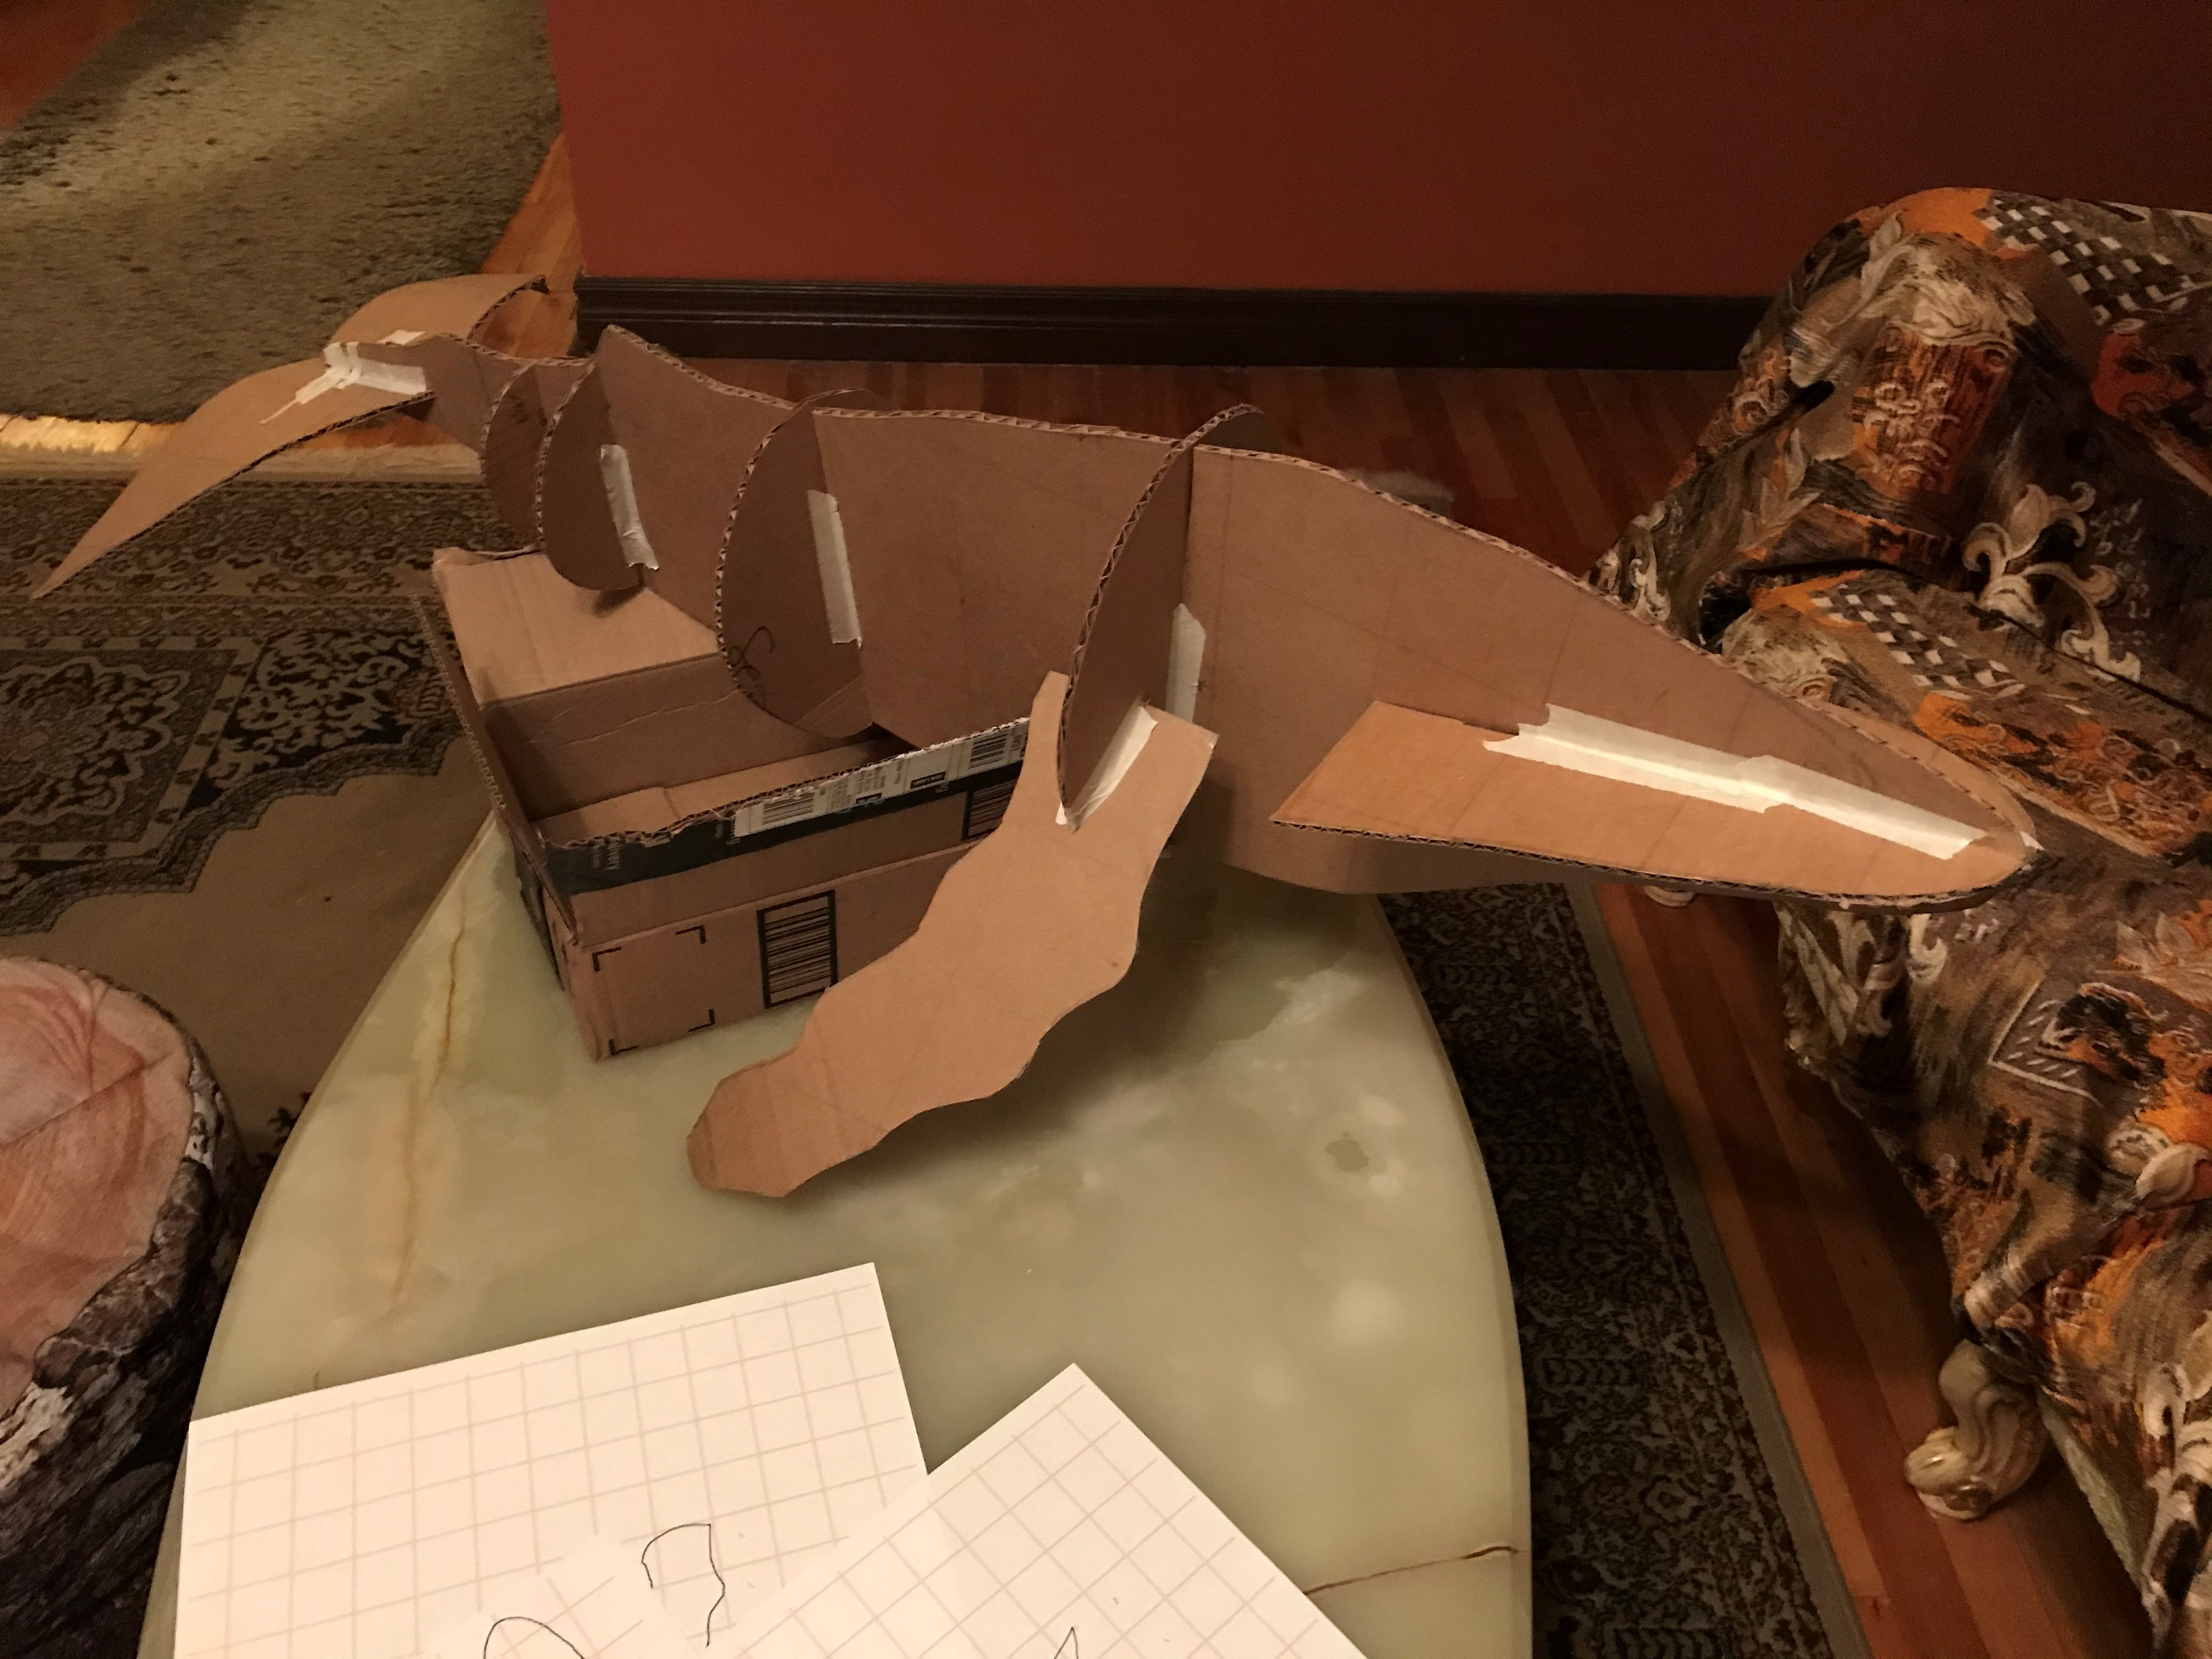 paper mache humpback whale, in progress